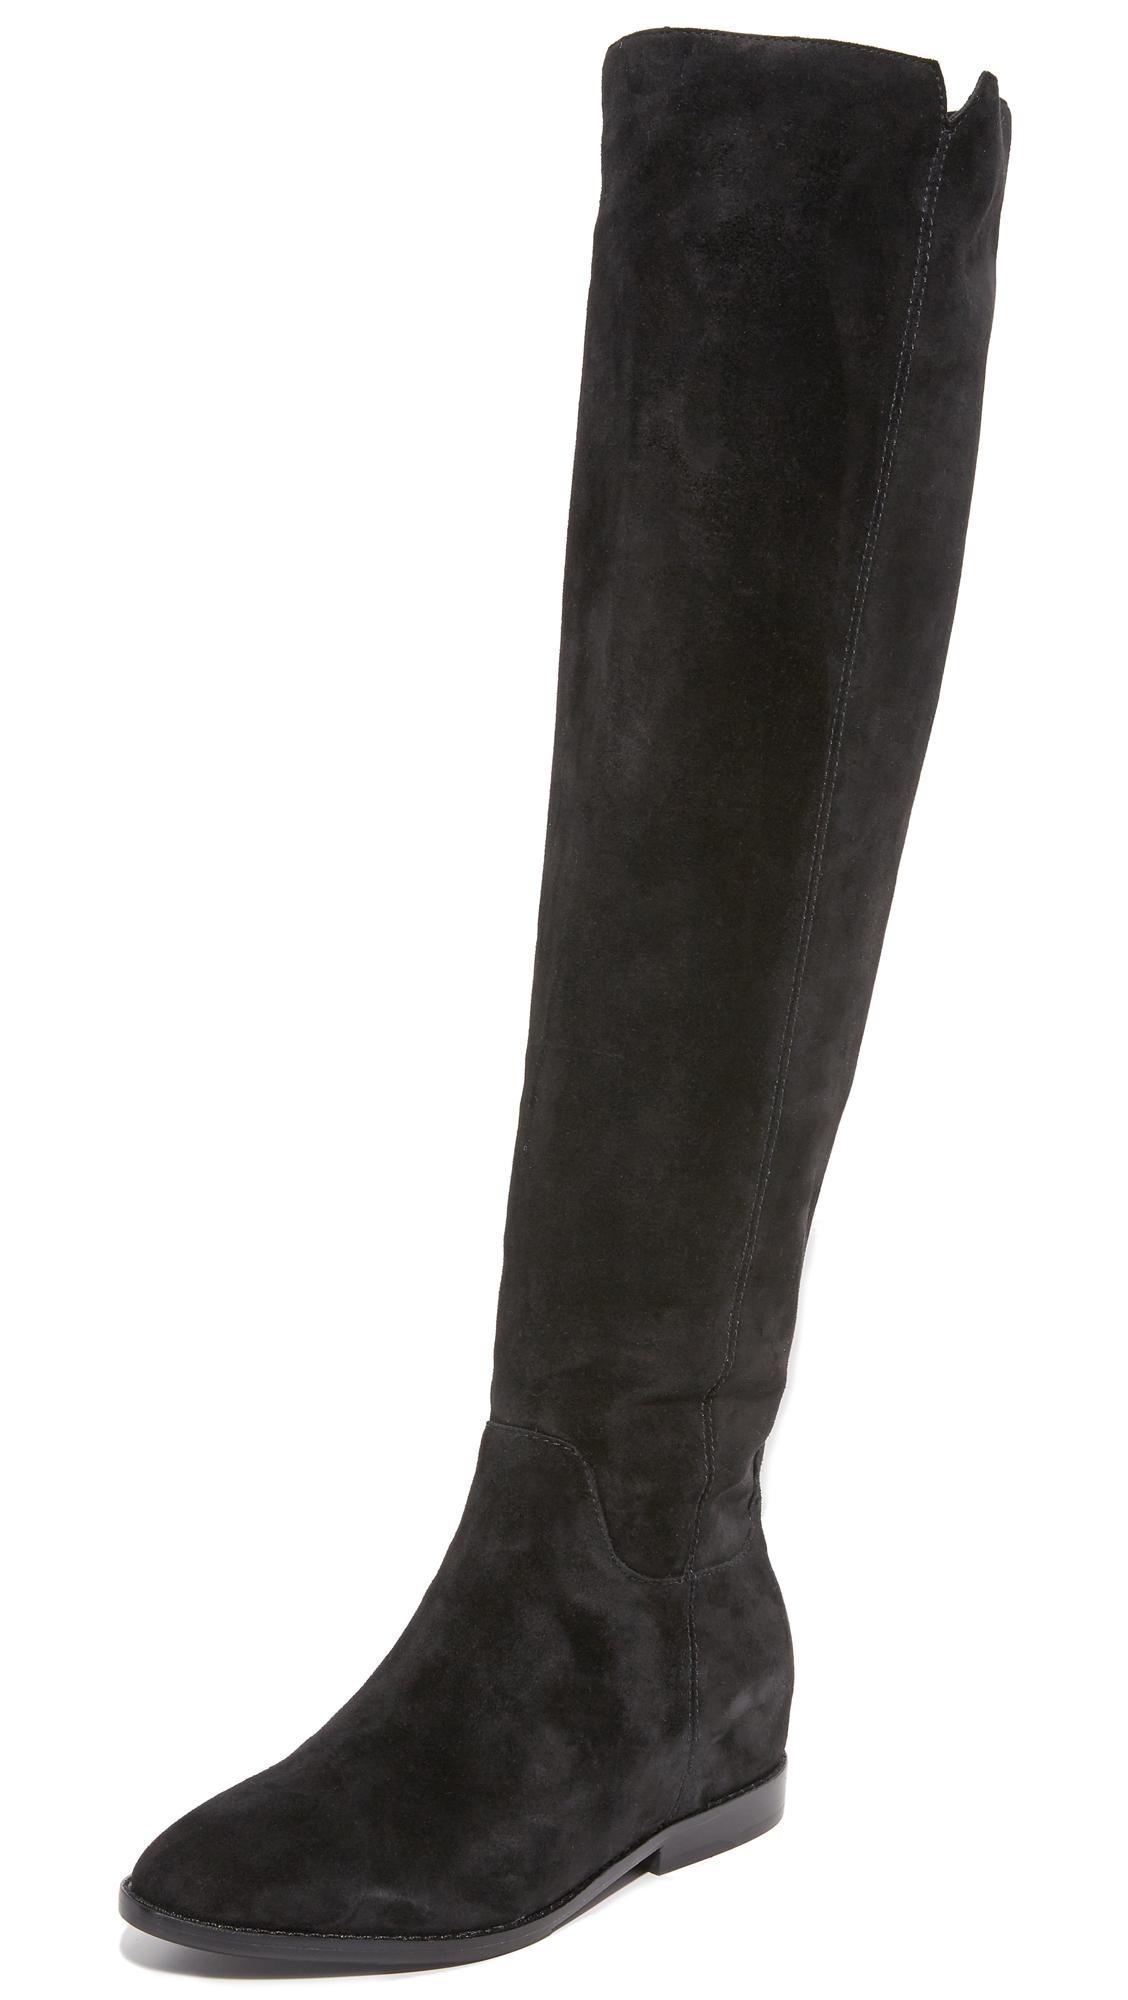 Ash Jess Boots - Black